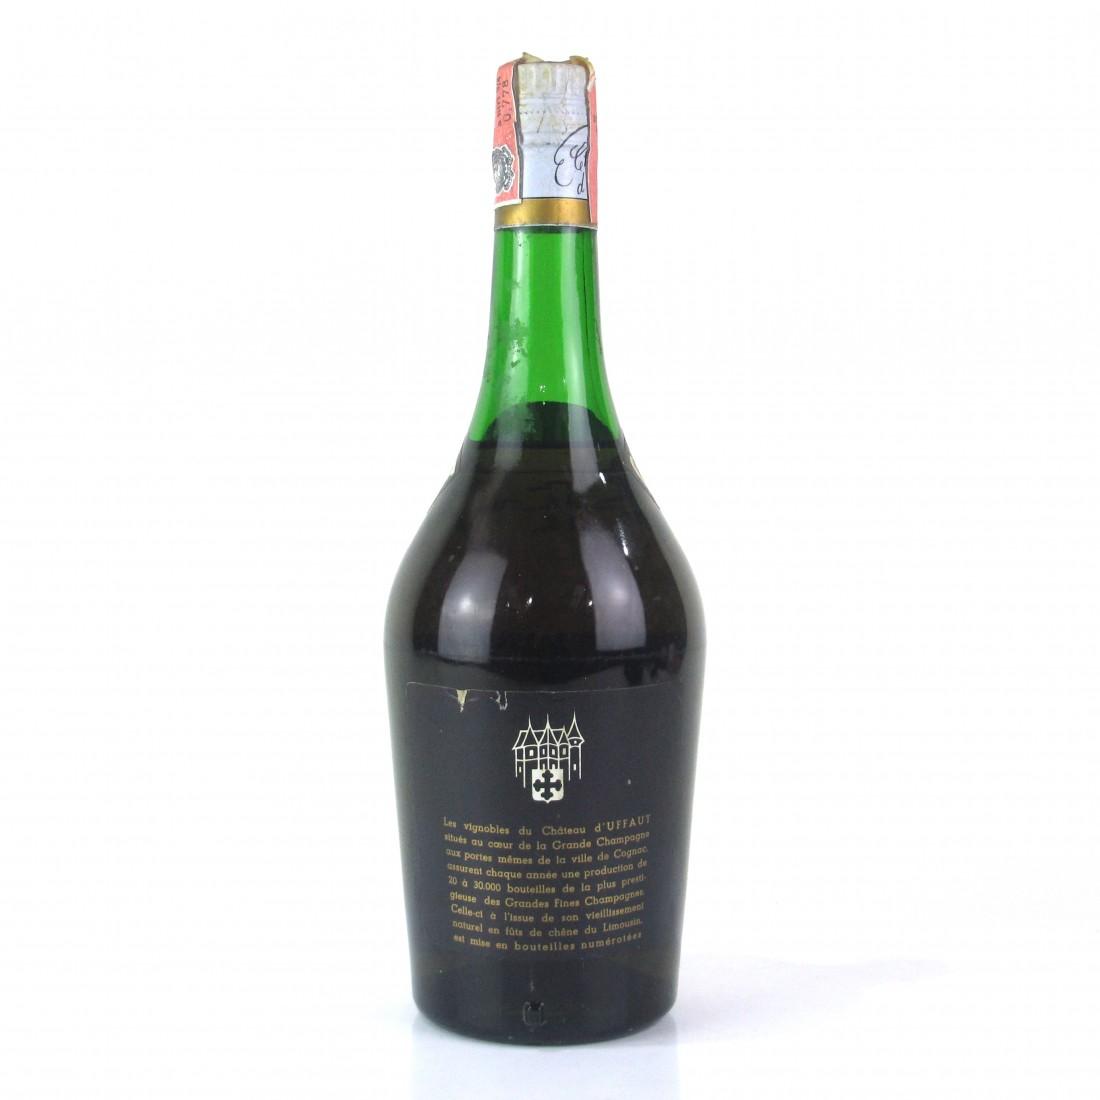 Chateau D'Uffaut Grande-Champagne Cognac 1970s